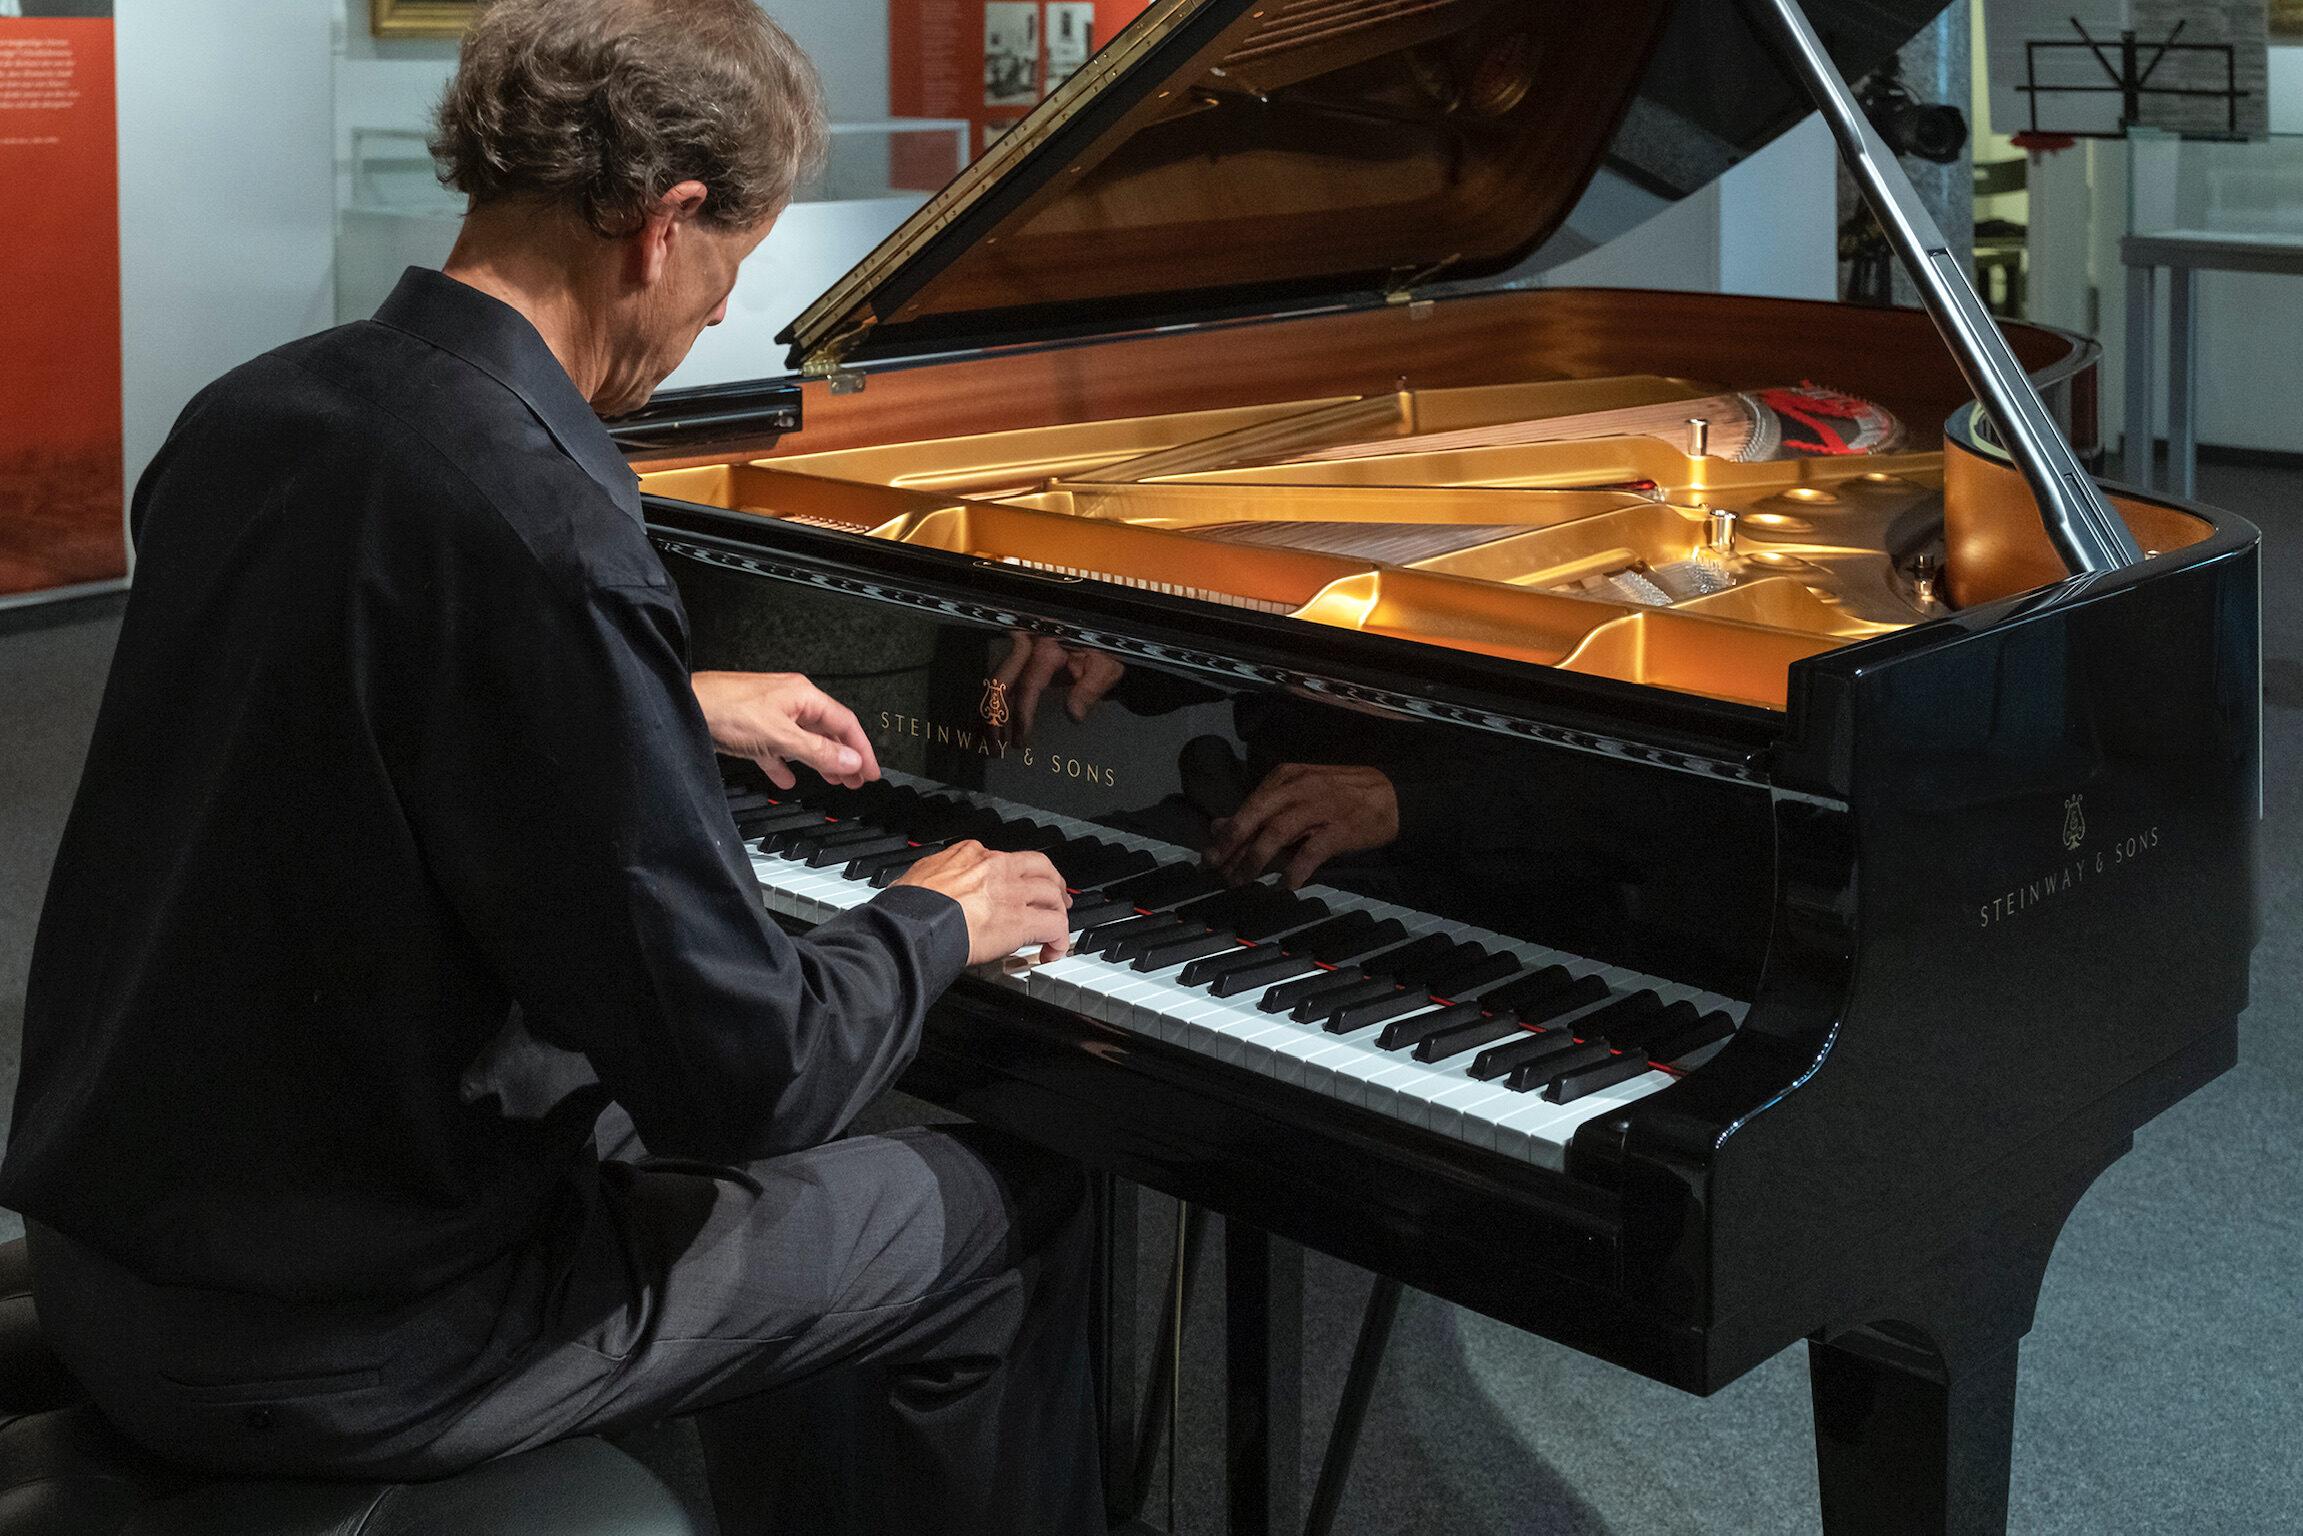 Dr. David Korevaar playing a Steinway concert grand.